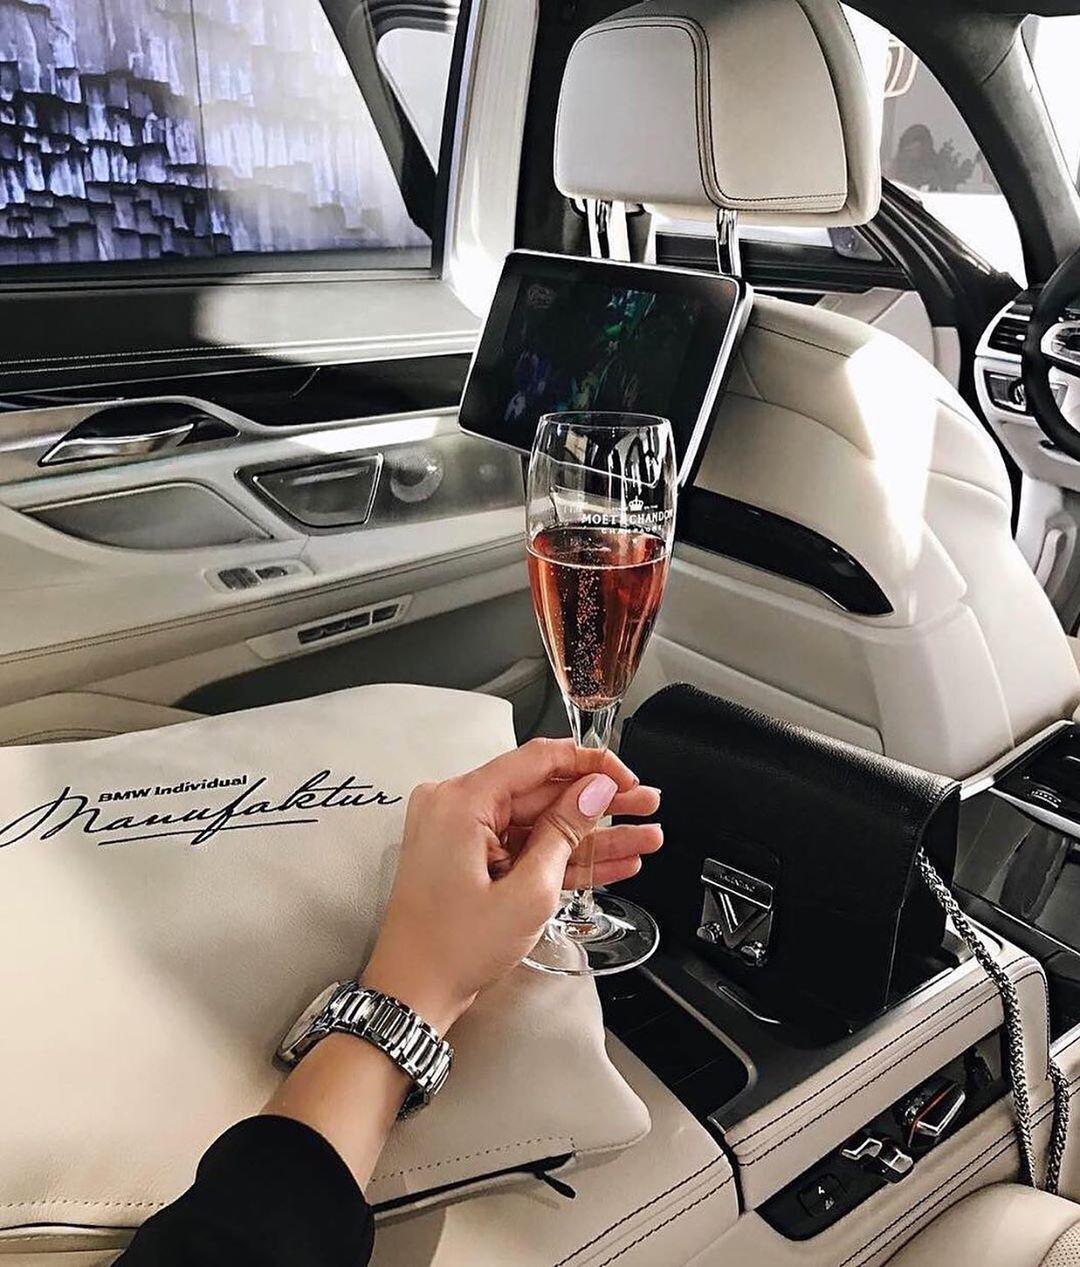 Classy Luxury Inspiration On Instagram Kodzayeva Inspiration Fashion Luxury Lifestyle Fashion Luxury Lifestyle Women Luxury Lifestyle Dreams